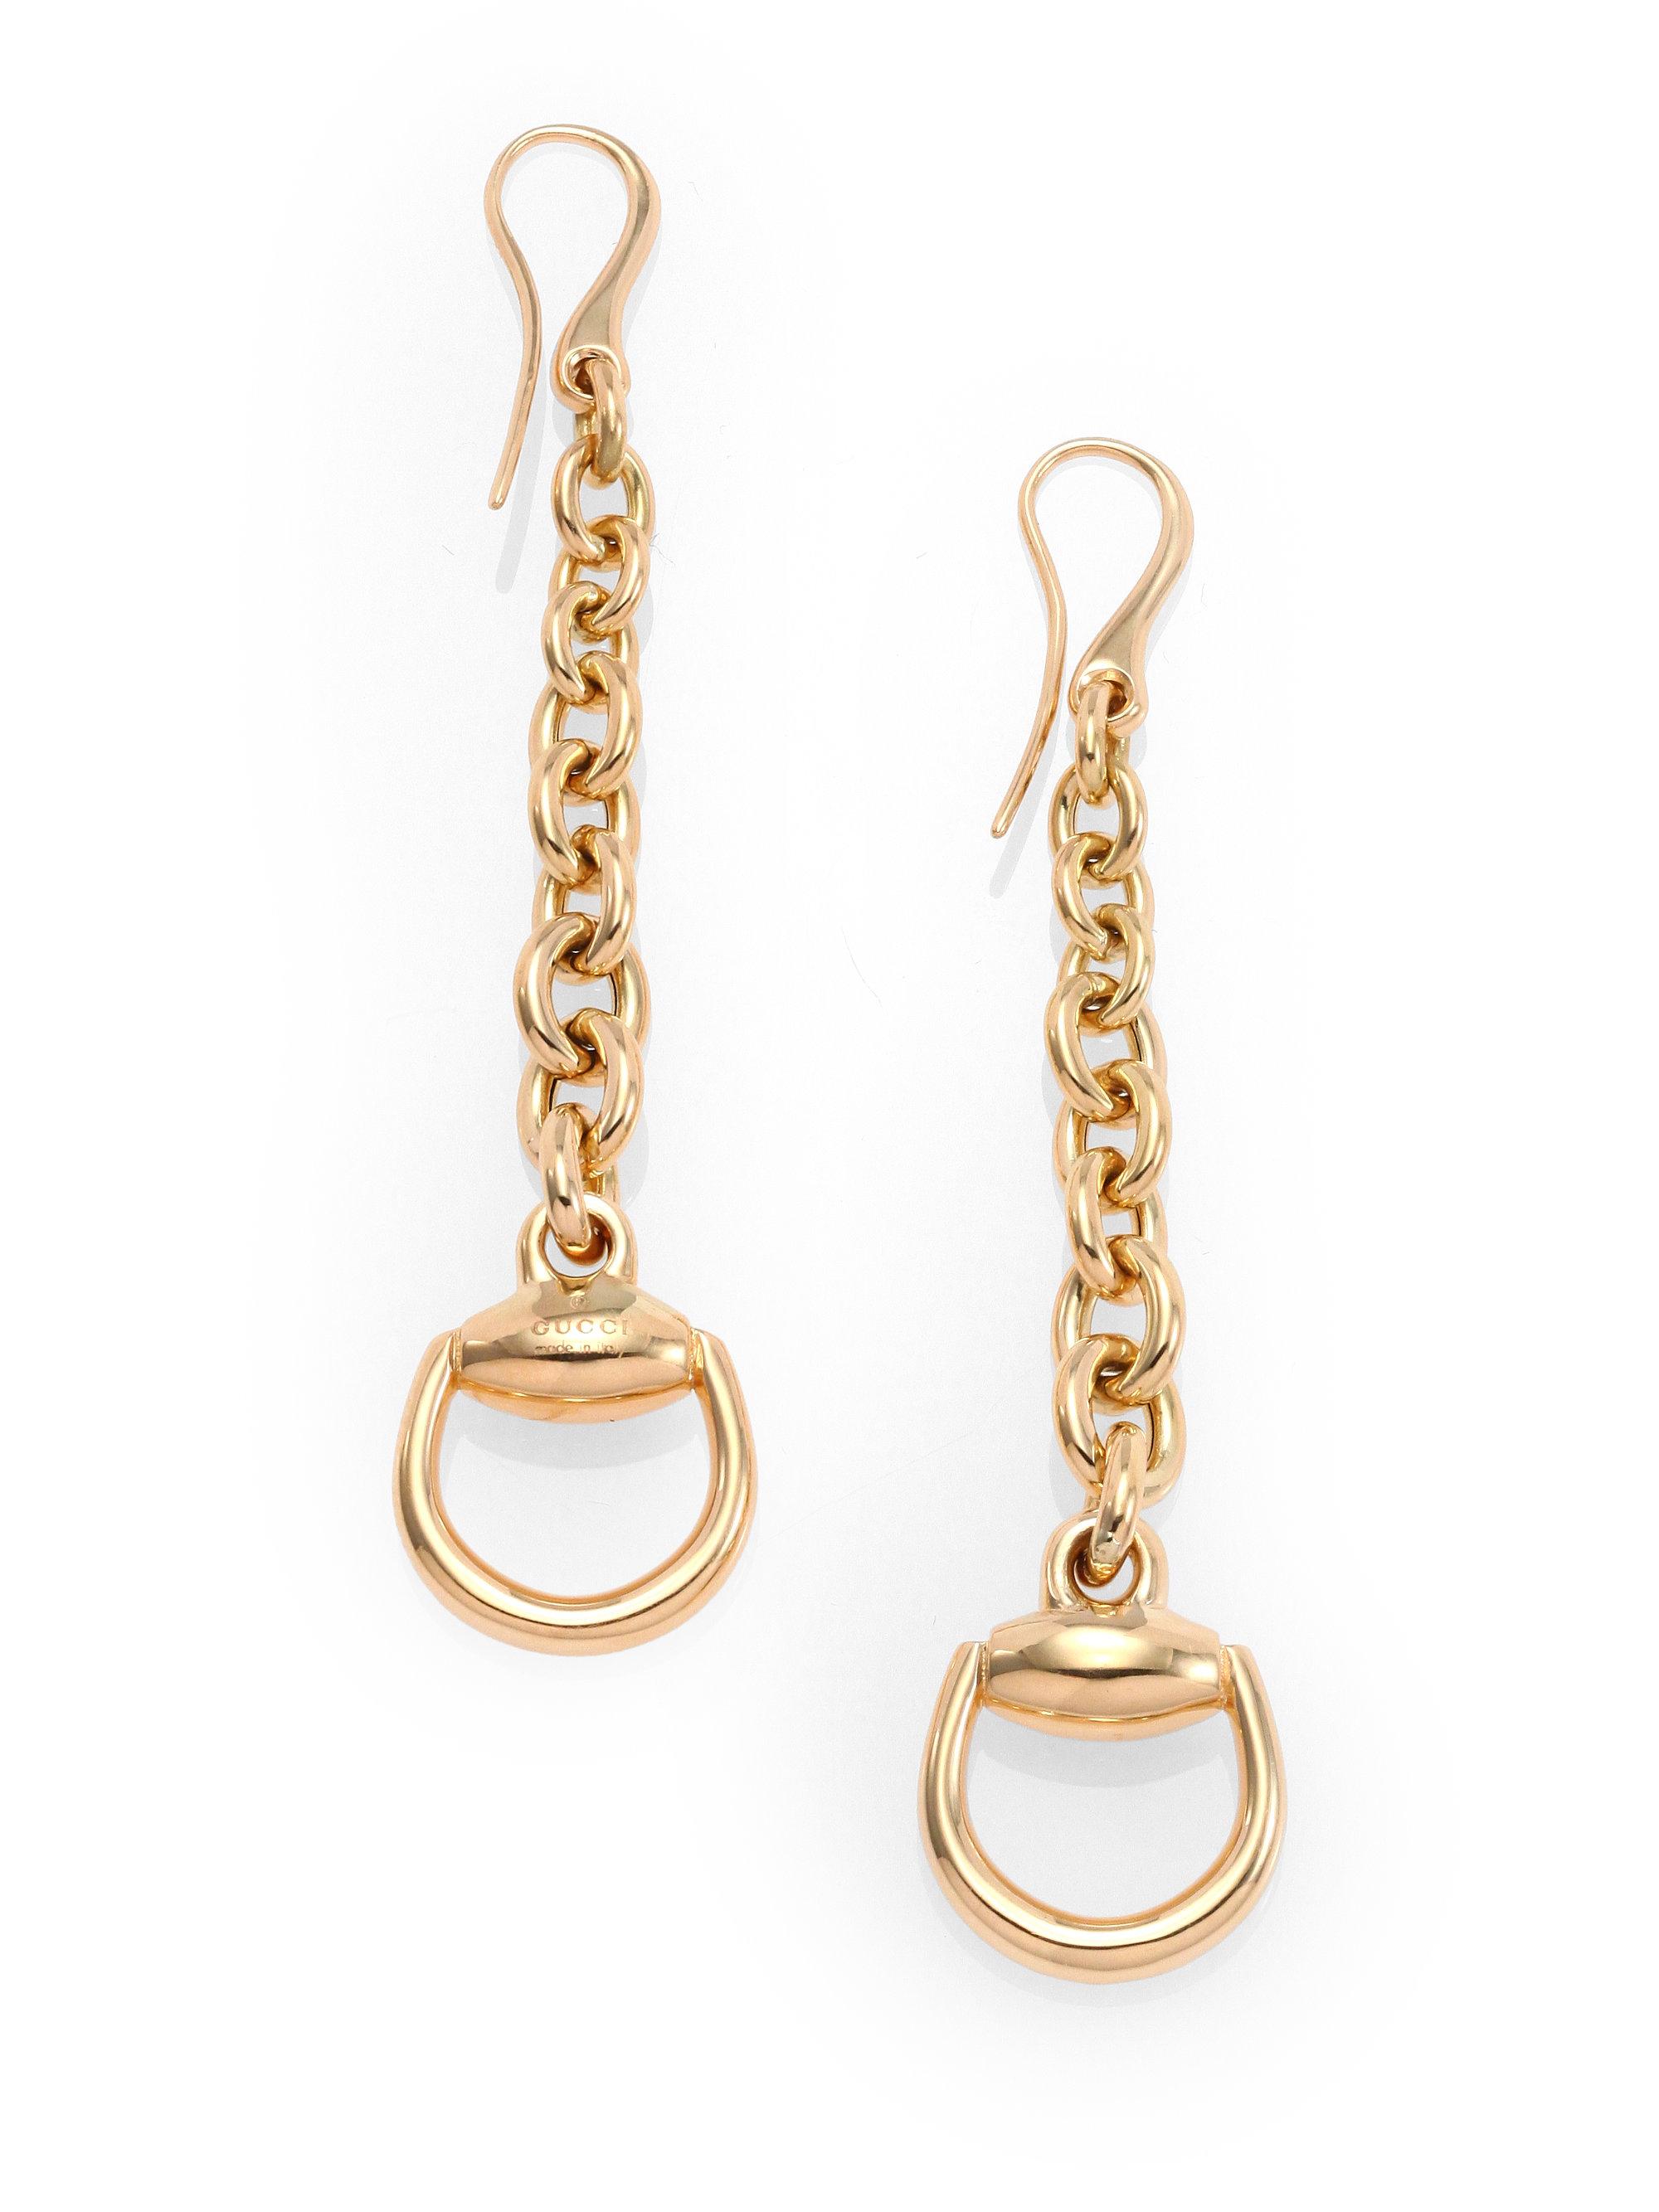 7056a08daf7 Lyst Gucci Horsebit 18k Yellow Gold Drop Earrings In Metallic